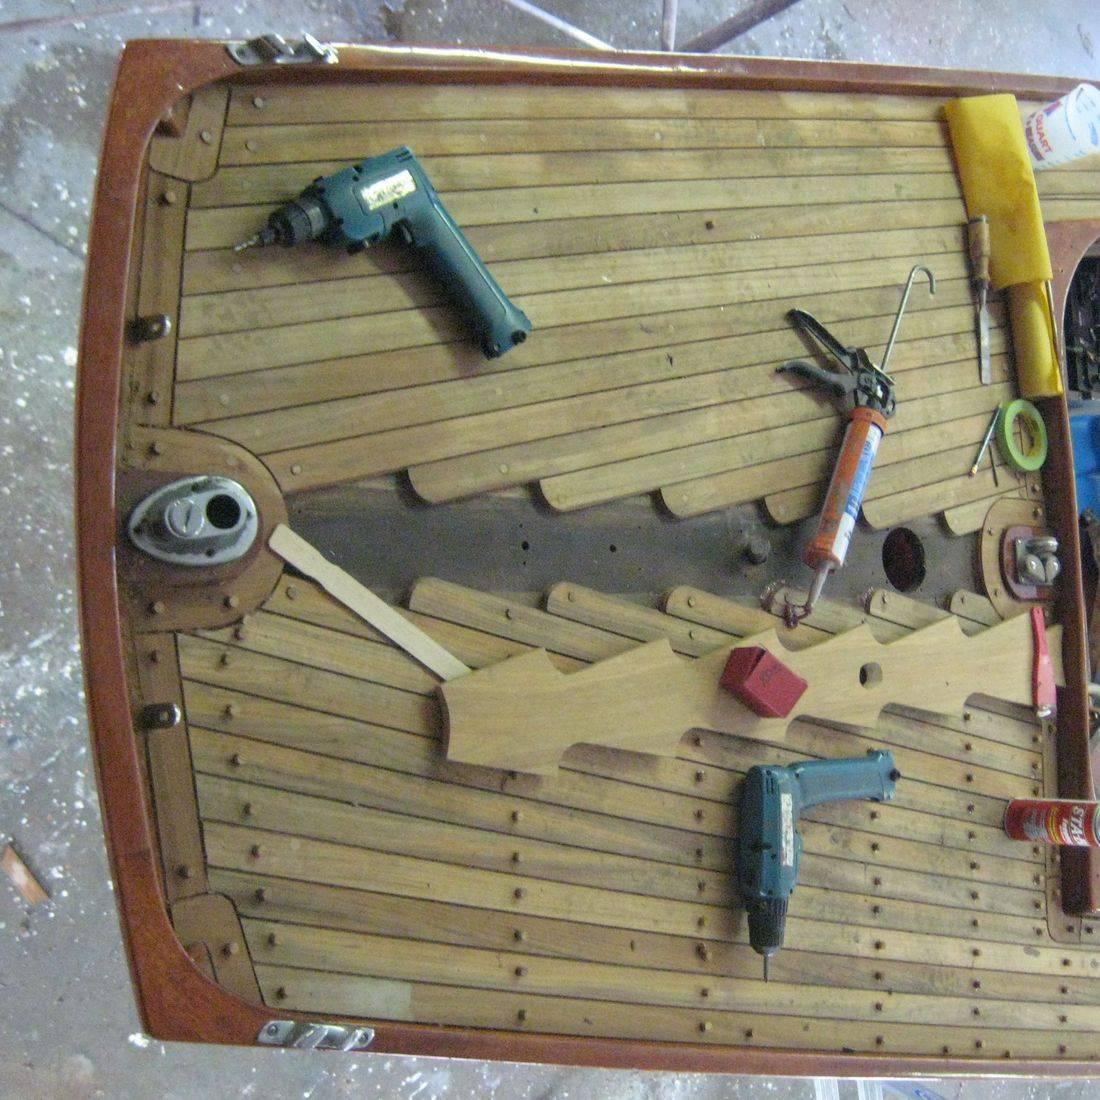 New deck by Bergersen Boat